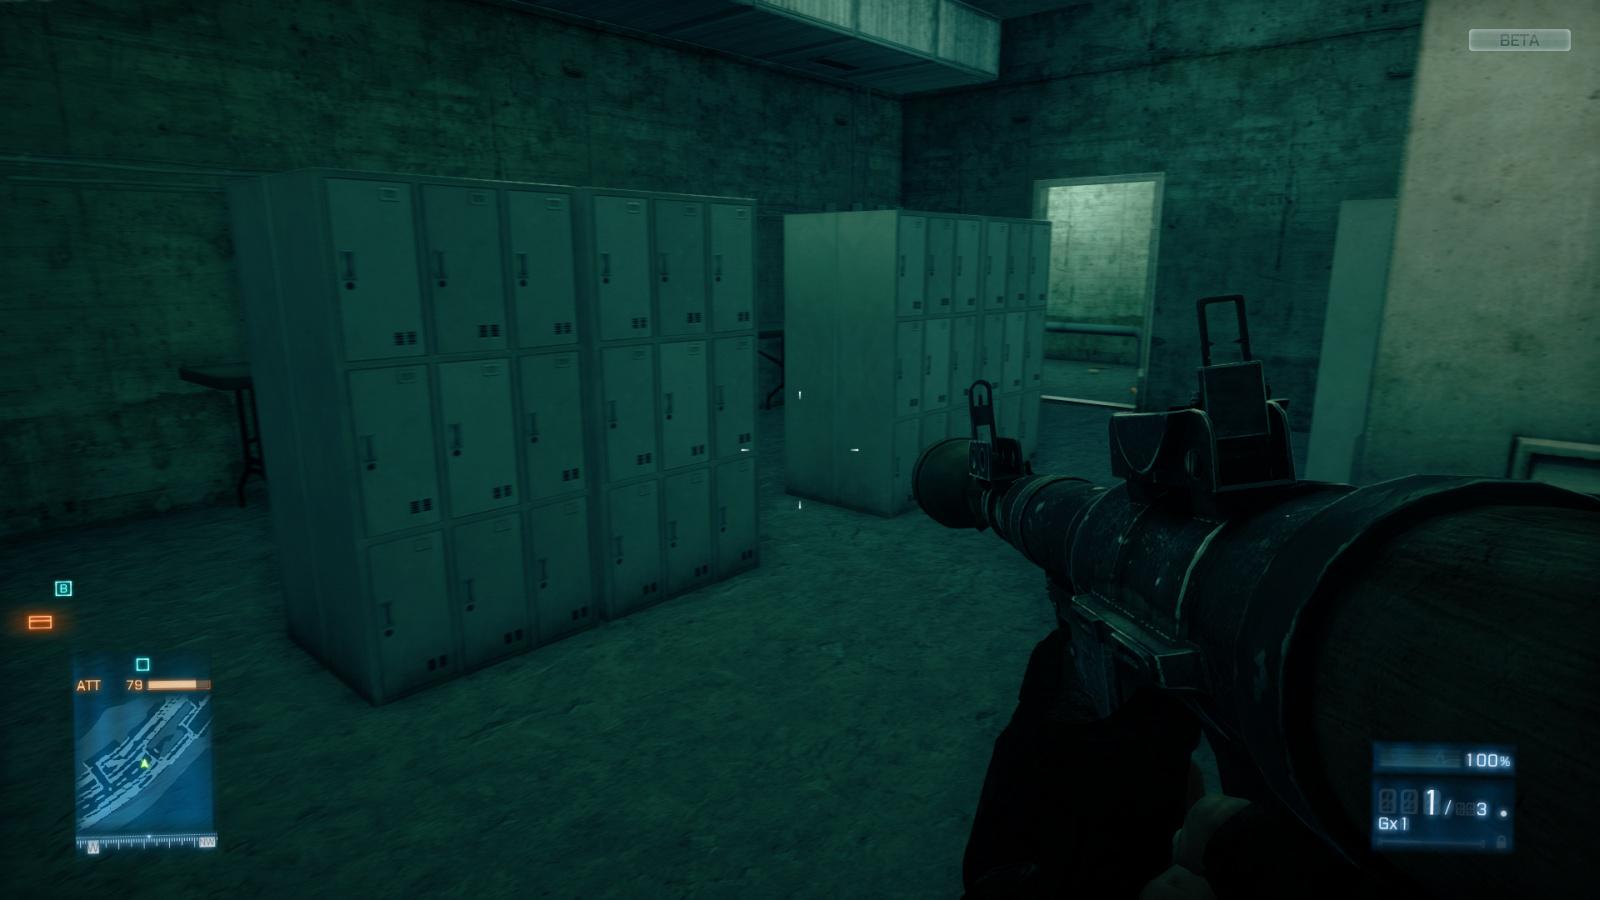 Beta Battlefieldu 3 je live – hratelnost, grafika, galerie 52434